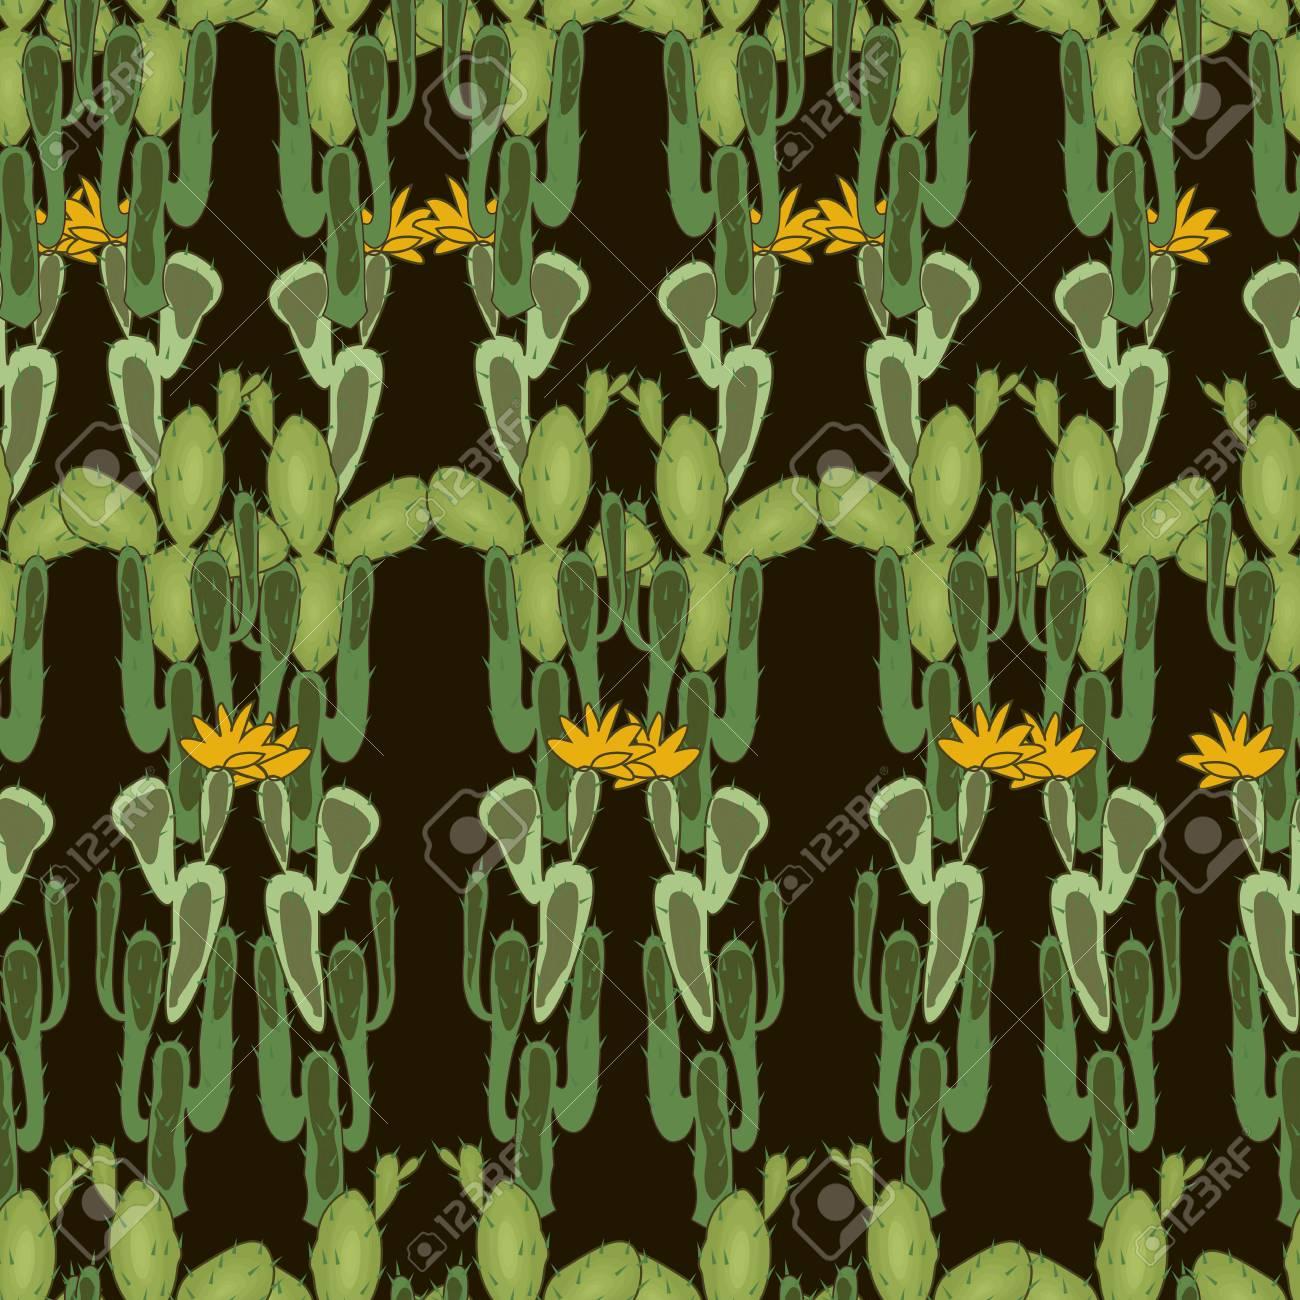 Wild West Seamless Background Cactus Peyote Buffalo Skull 1300x1300